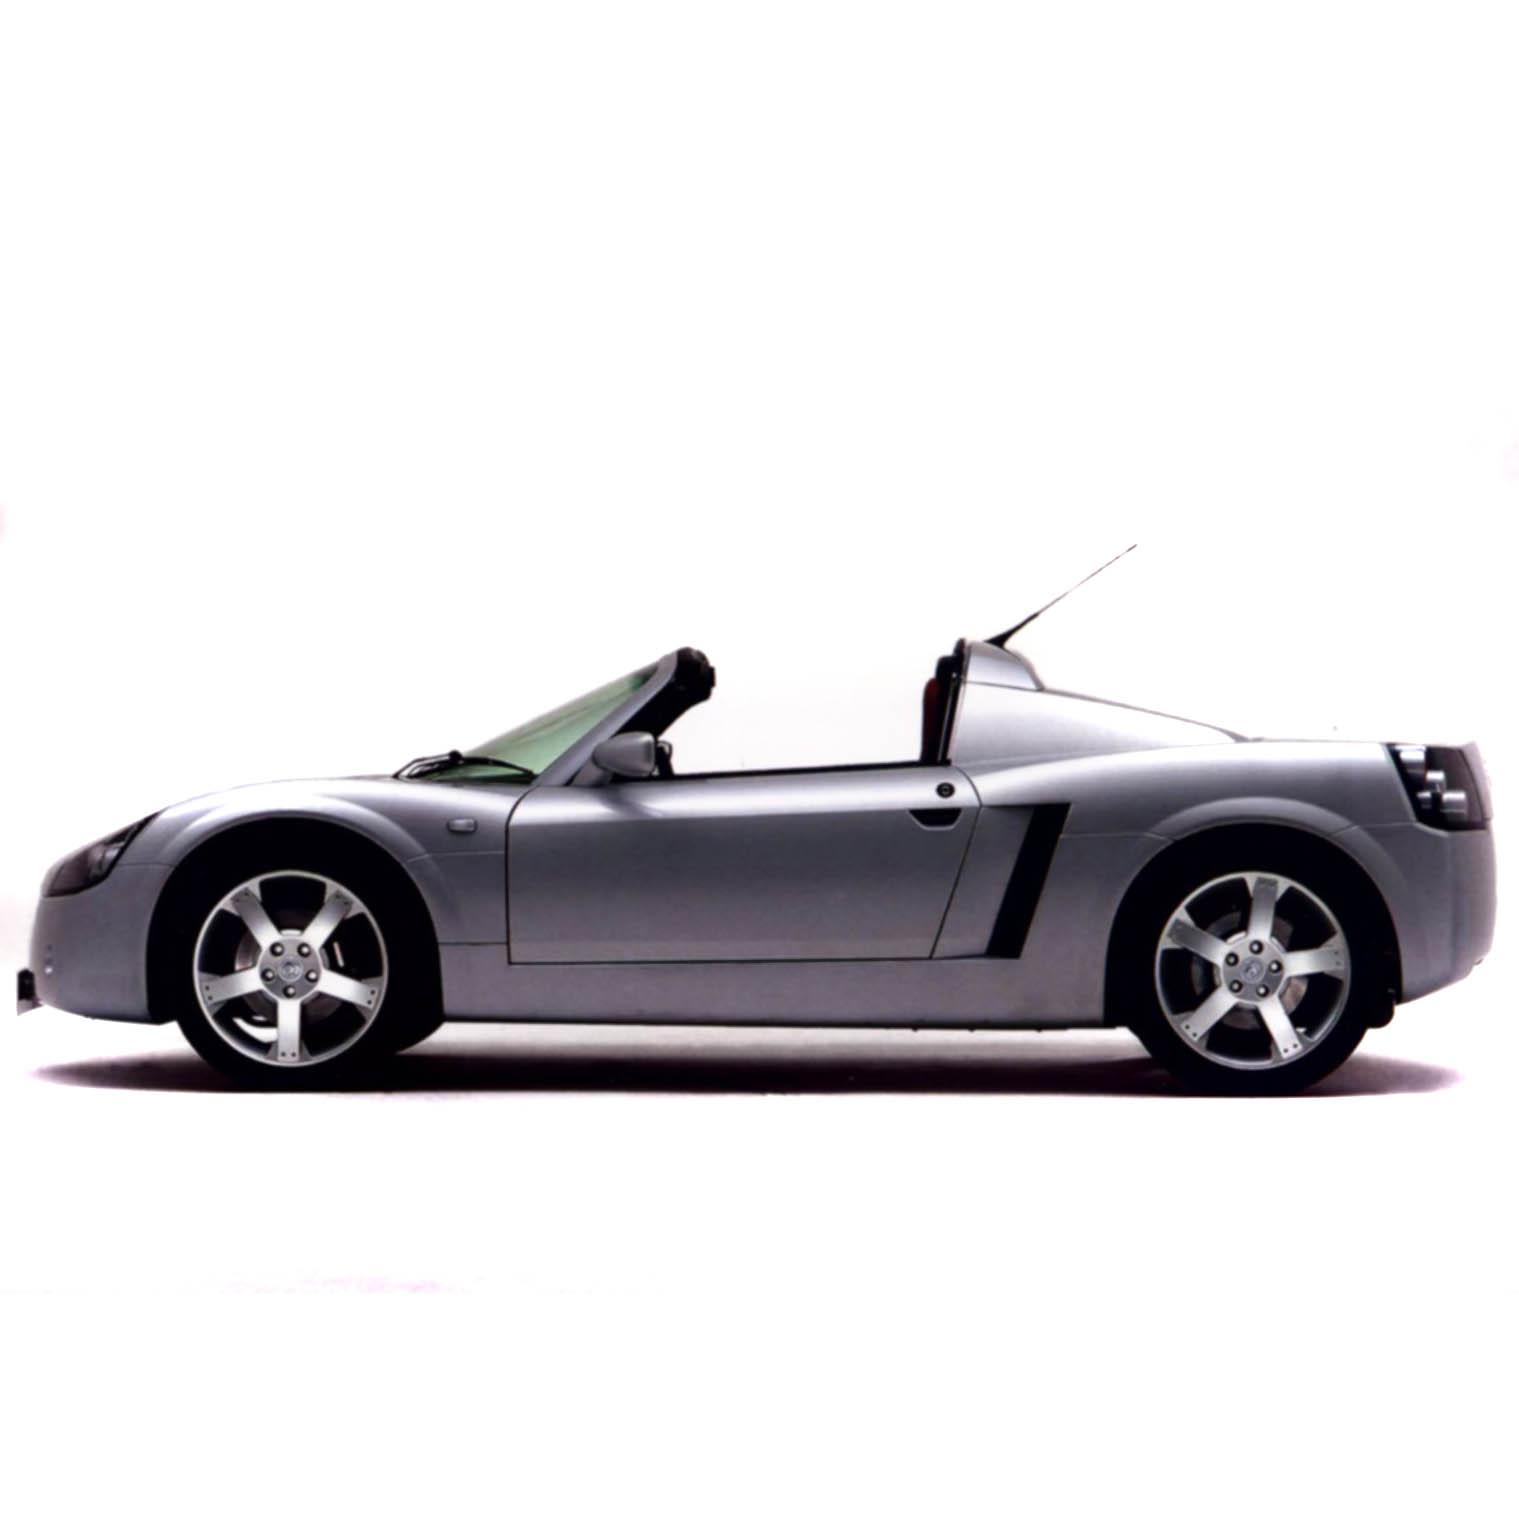 Vauxhall VX220 2000-2005 (non turbo)